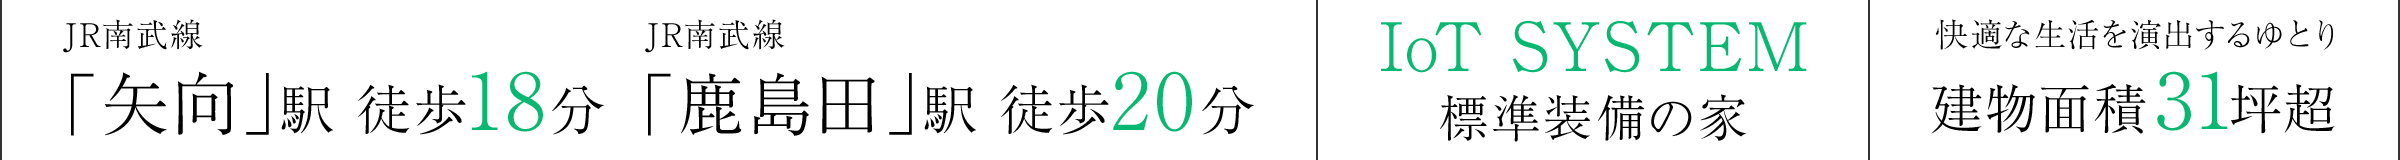 JR南武線「矢向」駅 徒歩18分 JR南武線「鹿島田」駅 徒歩20分 IoT SYSTEM 標準装備の家 快適な生活を演出するゆとり建物面積31坪超